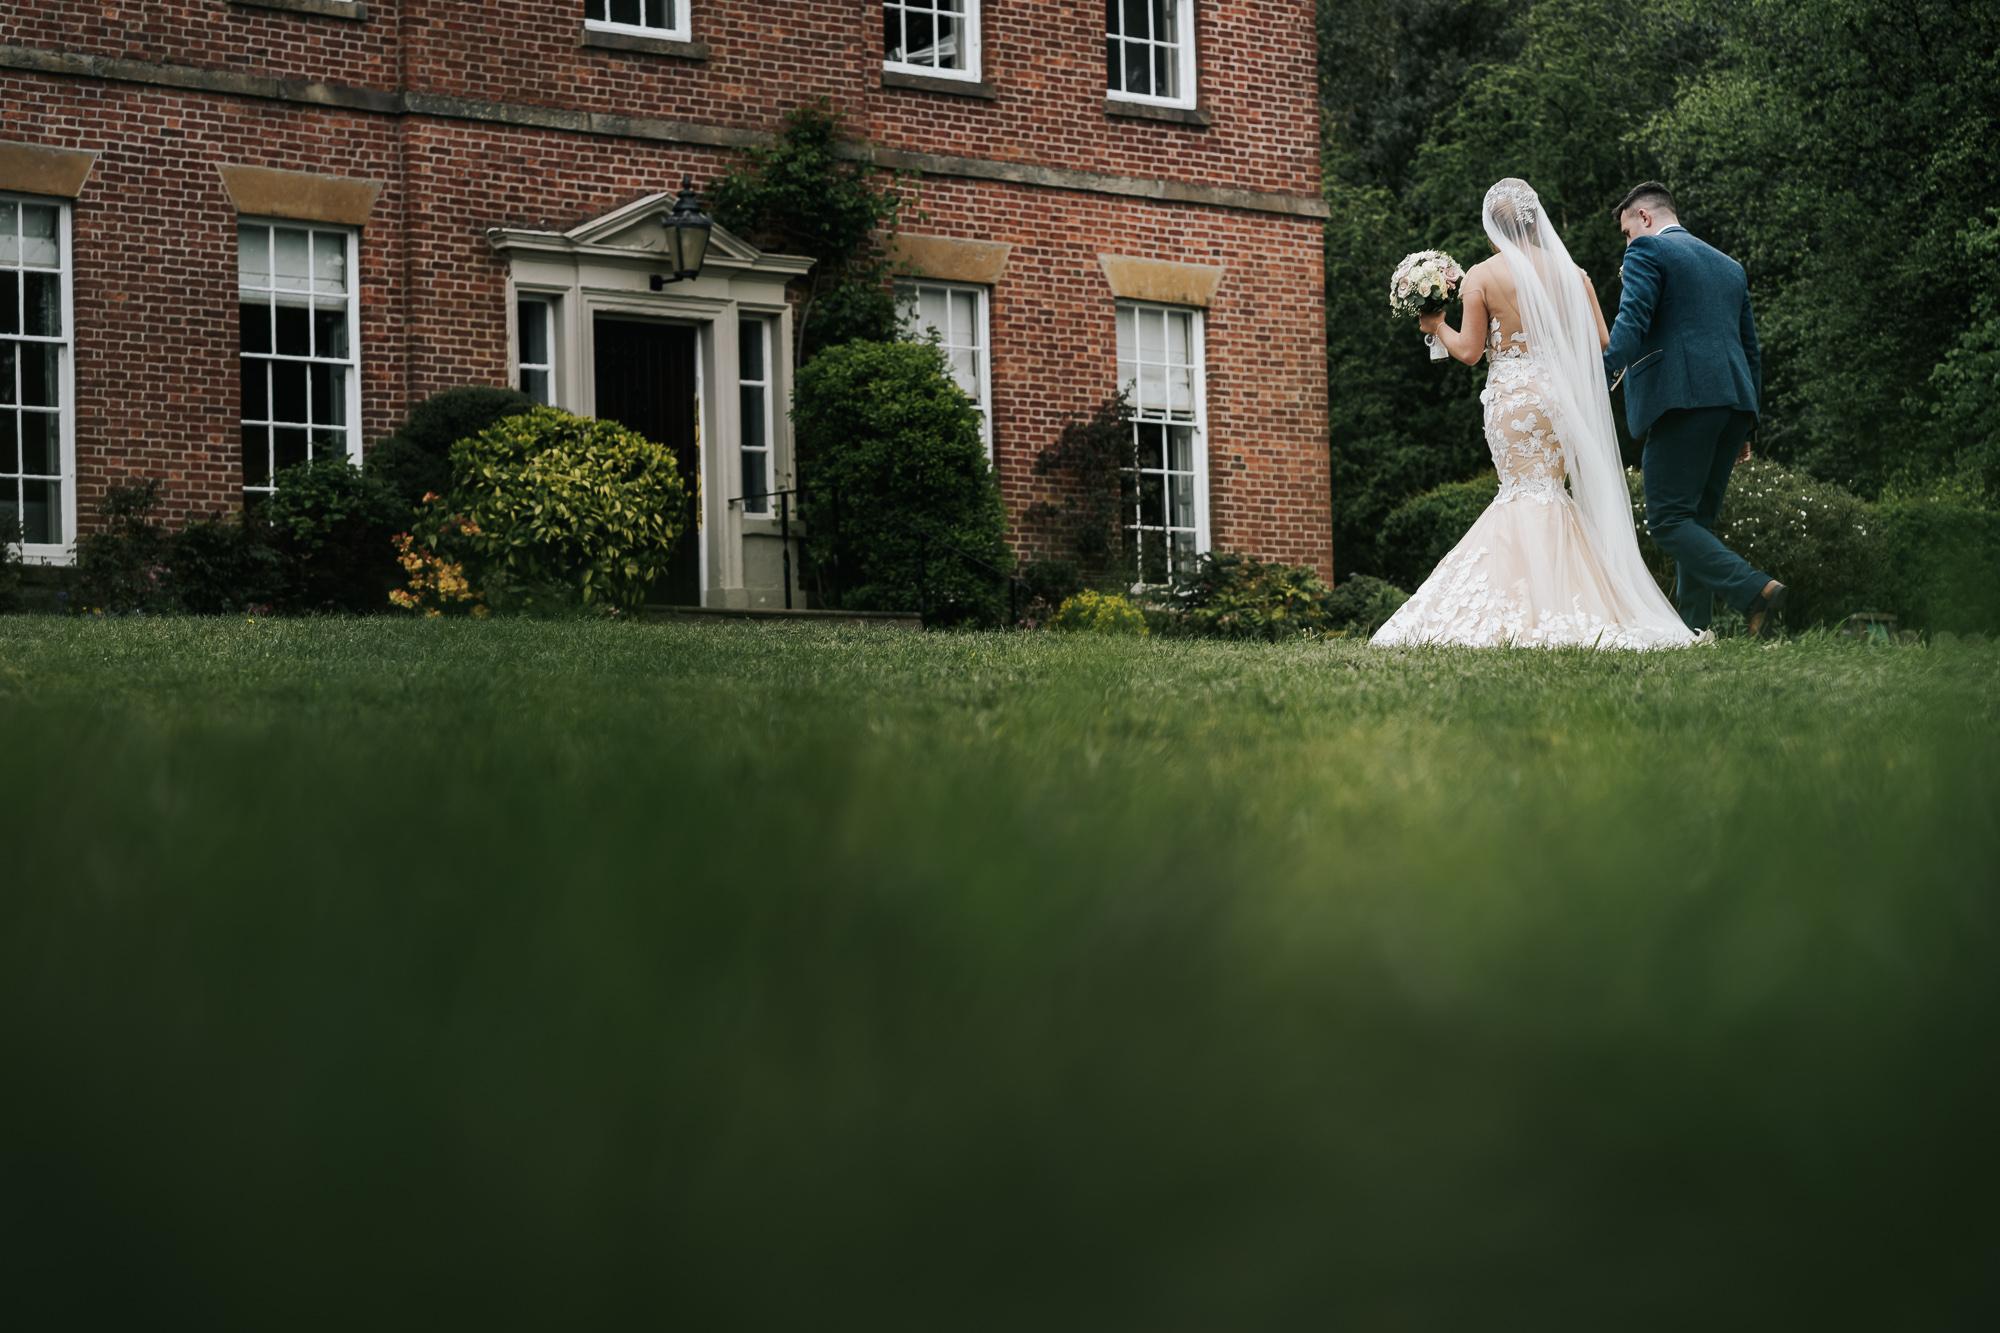 Rivington Hall Barn Wedding PHotographer lancashire wedding photography (26 of 34).jpg